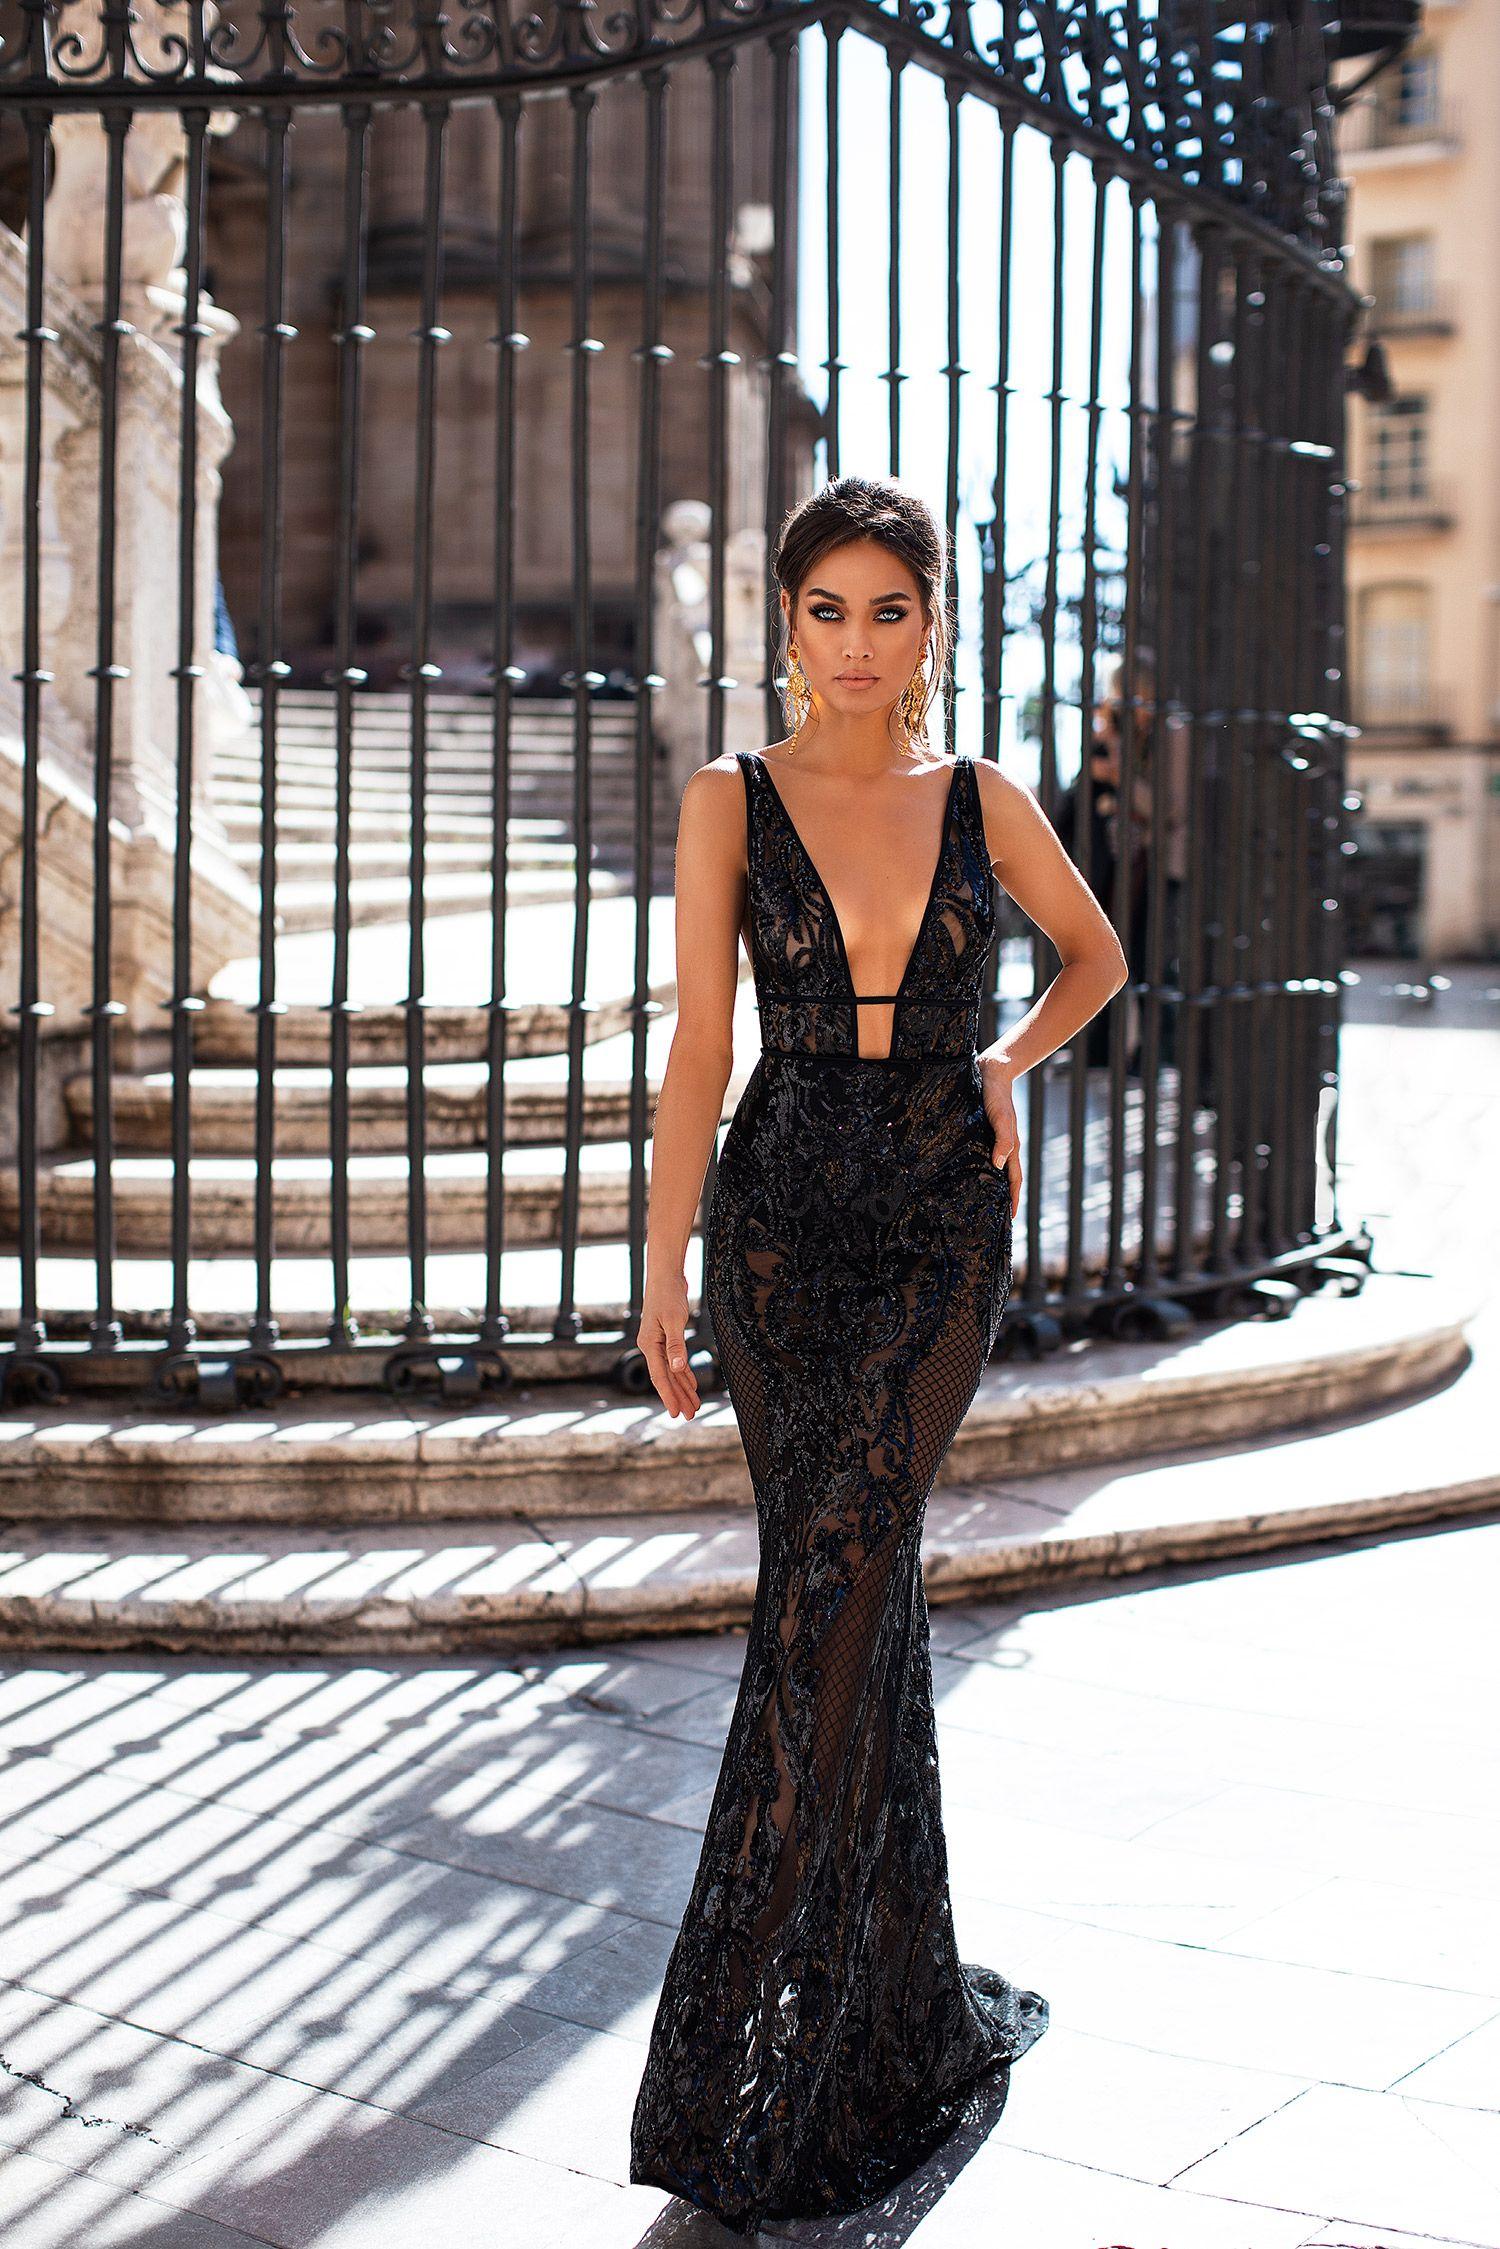 Elyse Black Formal Dresses For Women Black Sequin Dress Women Silk Dress [ 2249 x 1500 Pixel ]